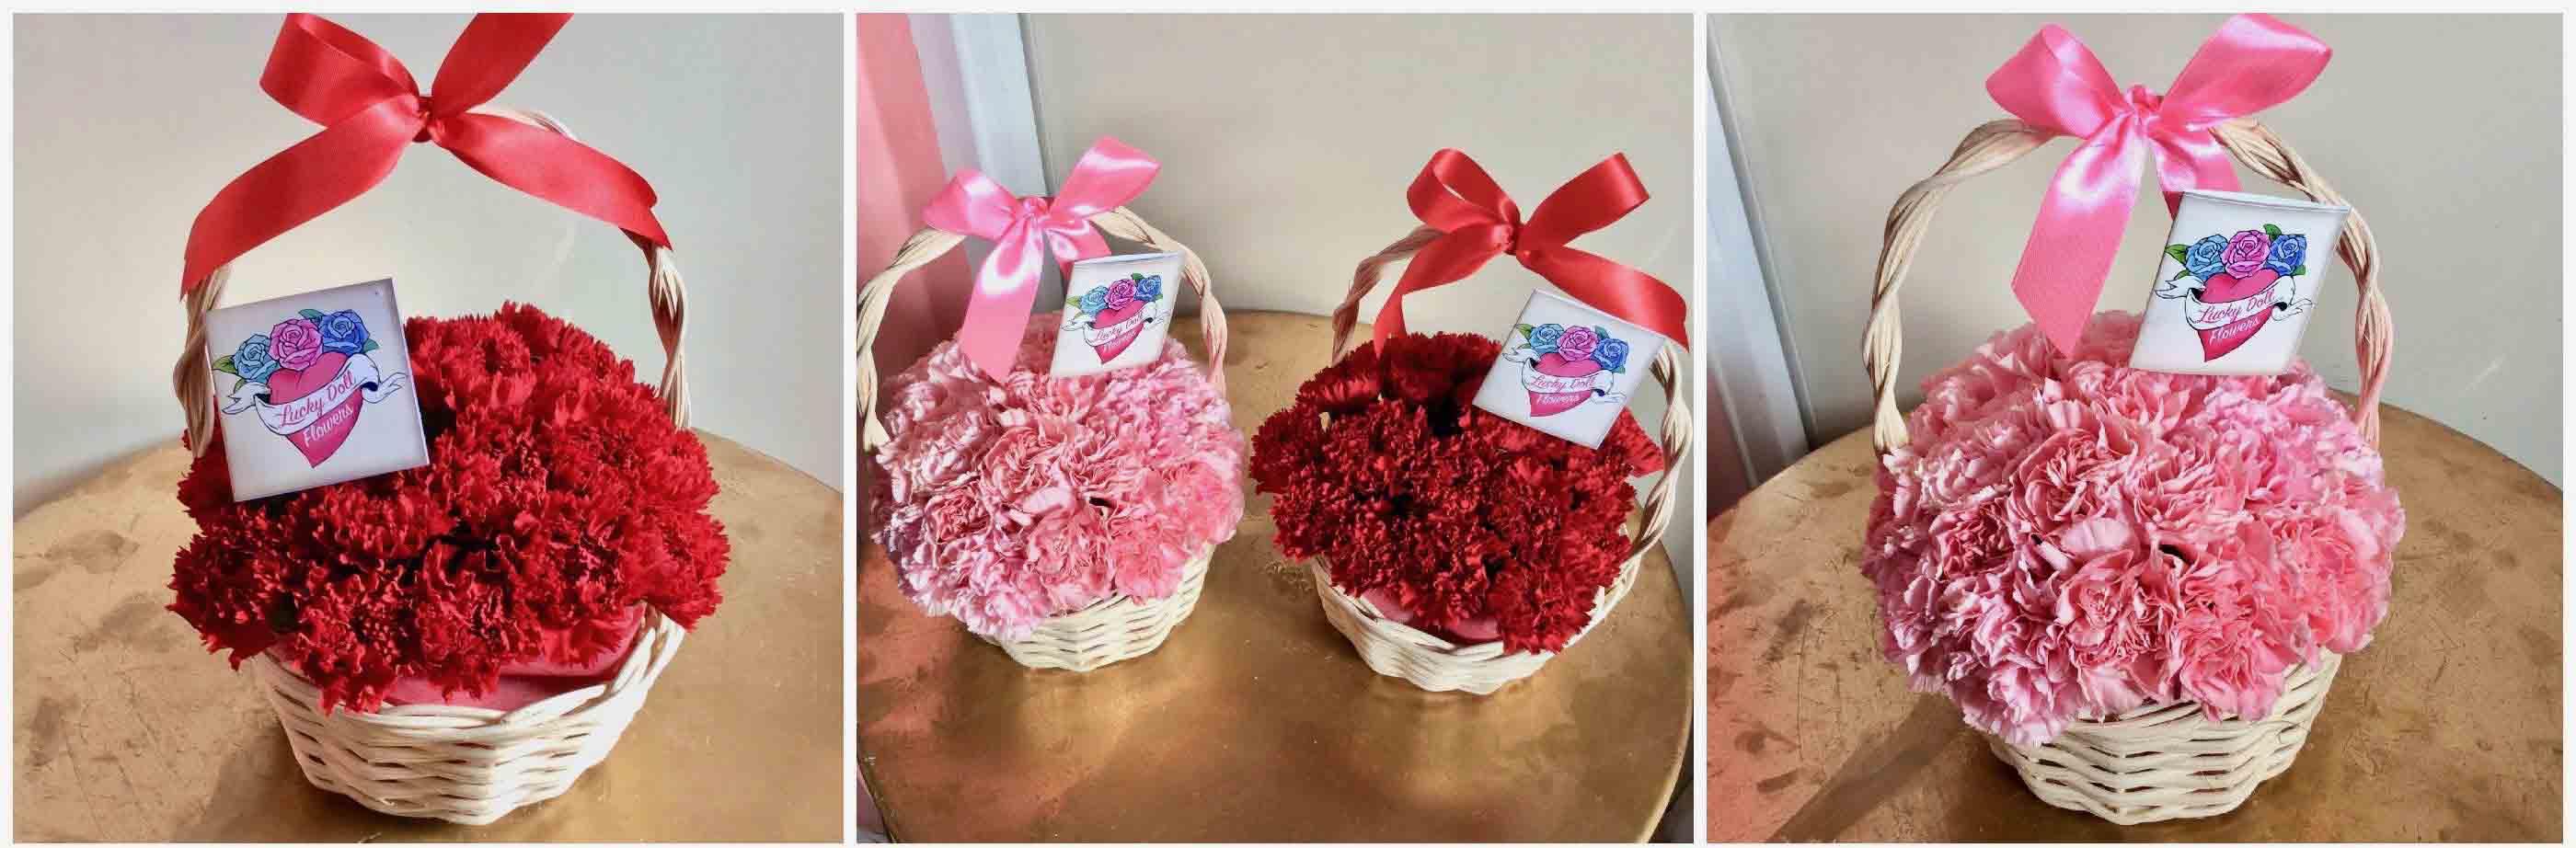 banner-baskets-carnation-small.jpg